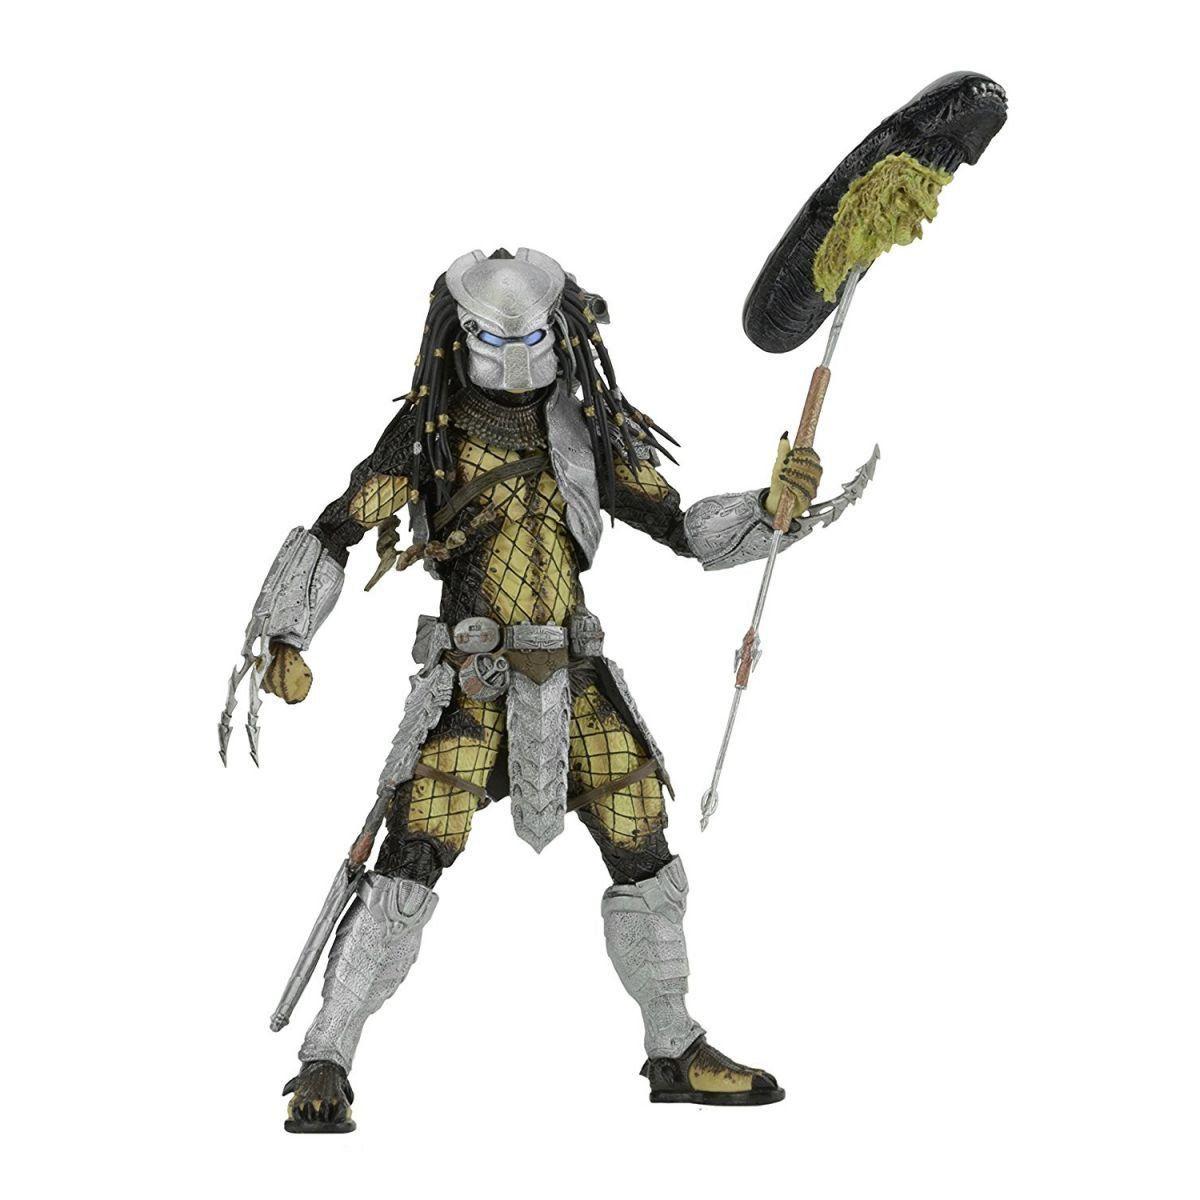 Boneco Youngblood Predador / Predator AvP (Alien Vs. Predador / Predator) Series 17 - Neca